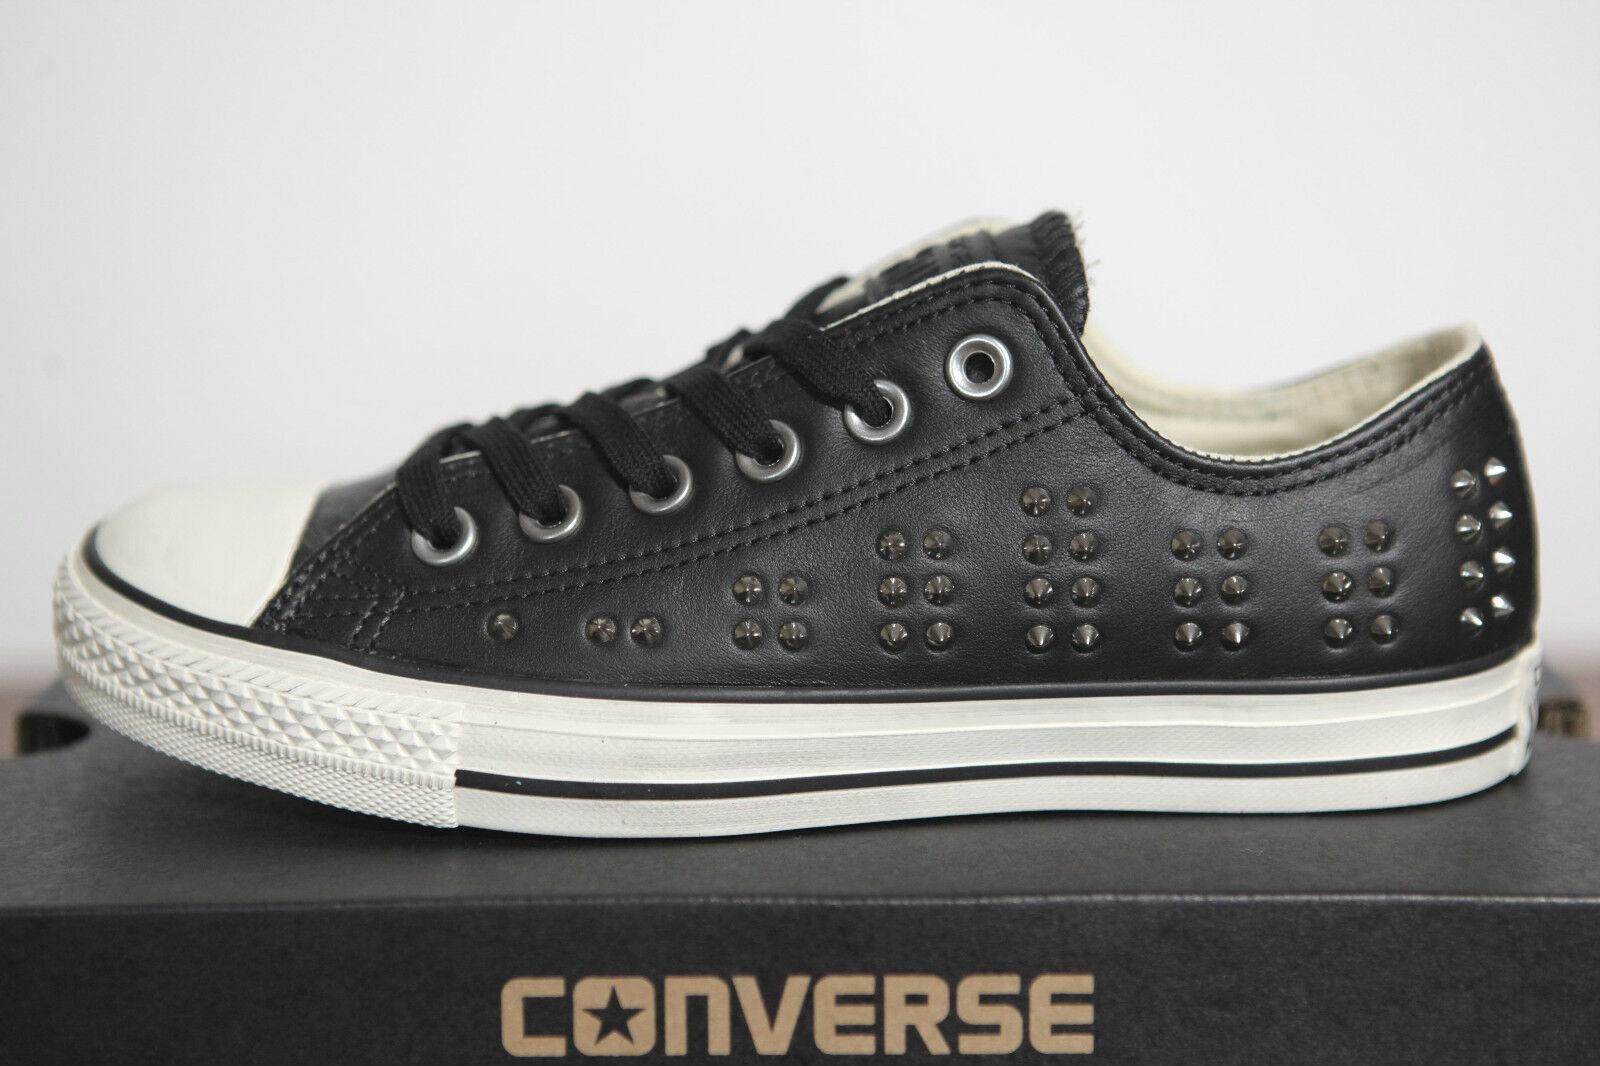 Neu All Star Converse Chucks low Leder Studded Sneaker 542417c Gr.37 UK 4,5